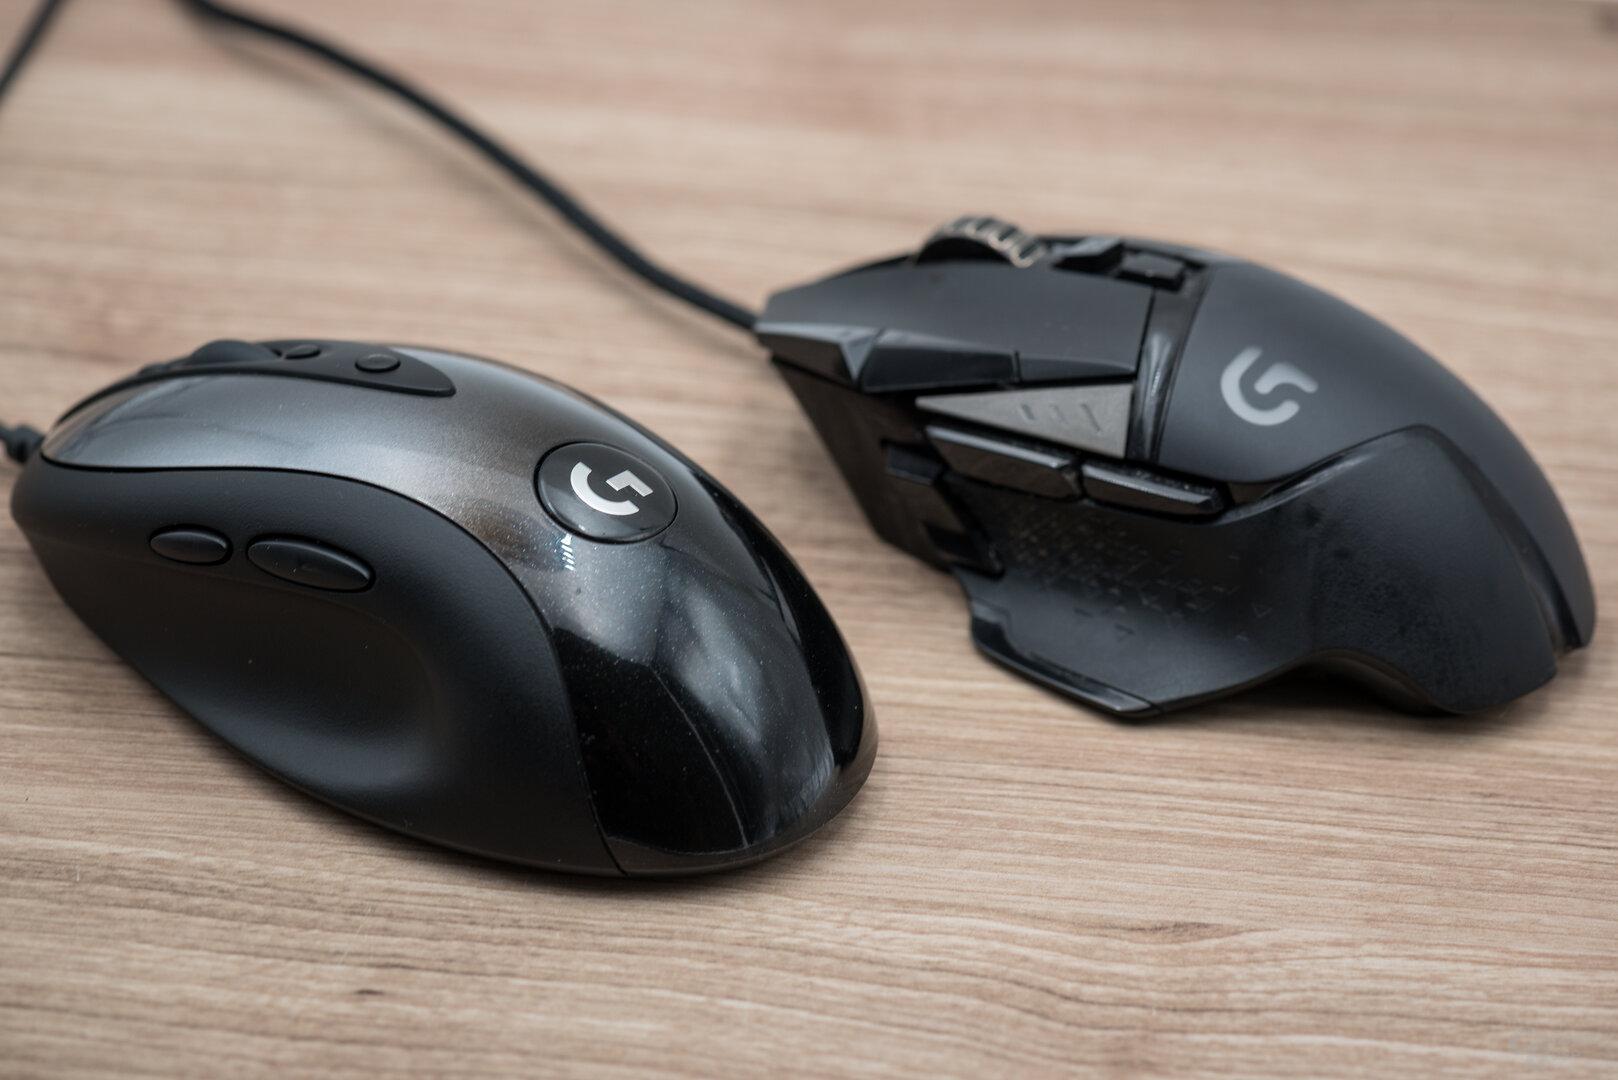 Logitech MX518 Legendary im Vergleich zur G502